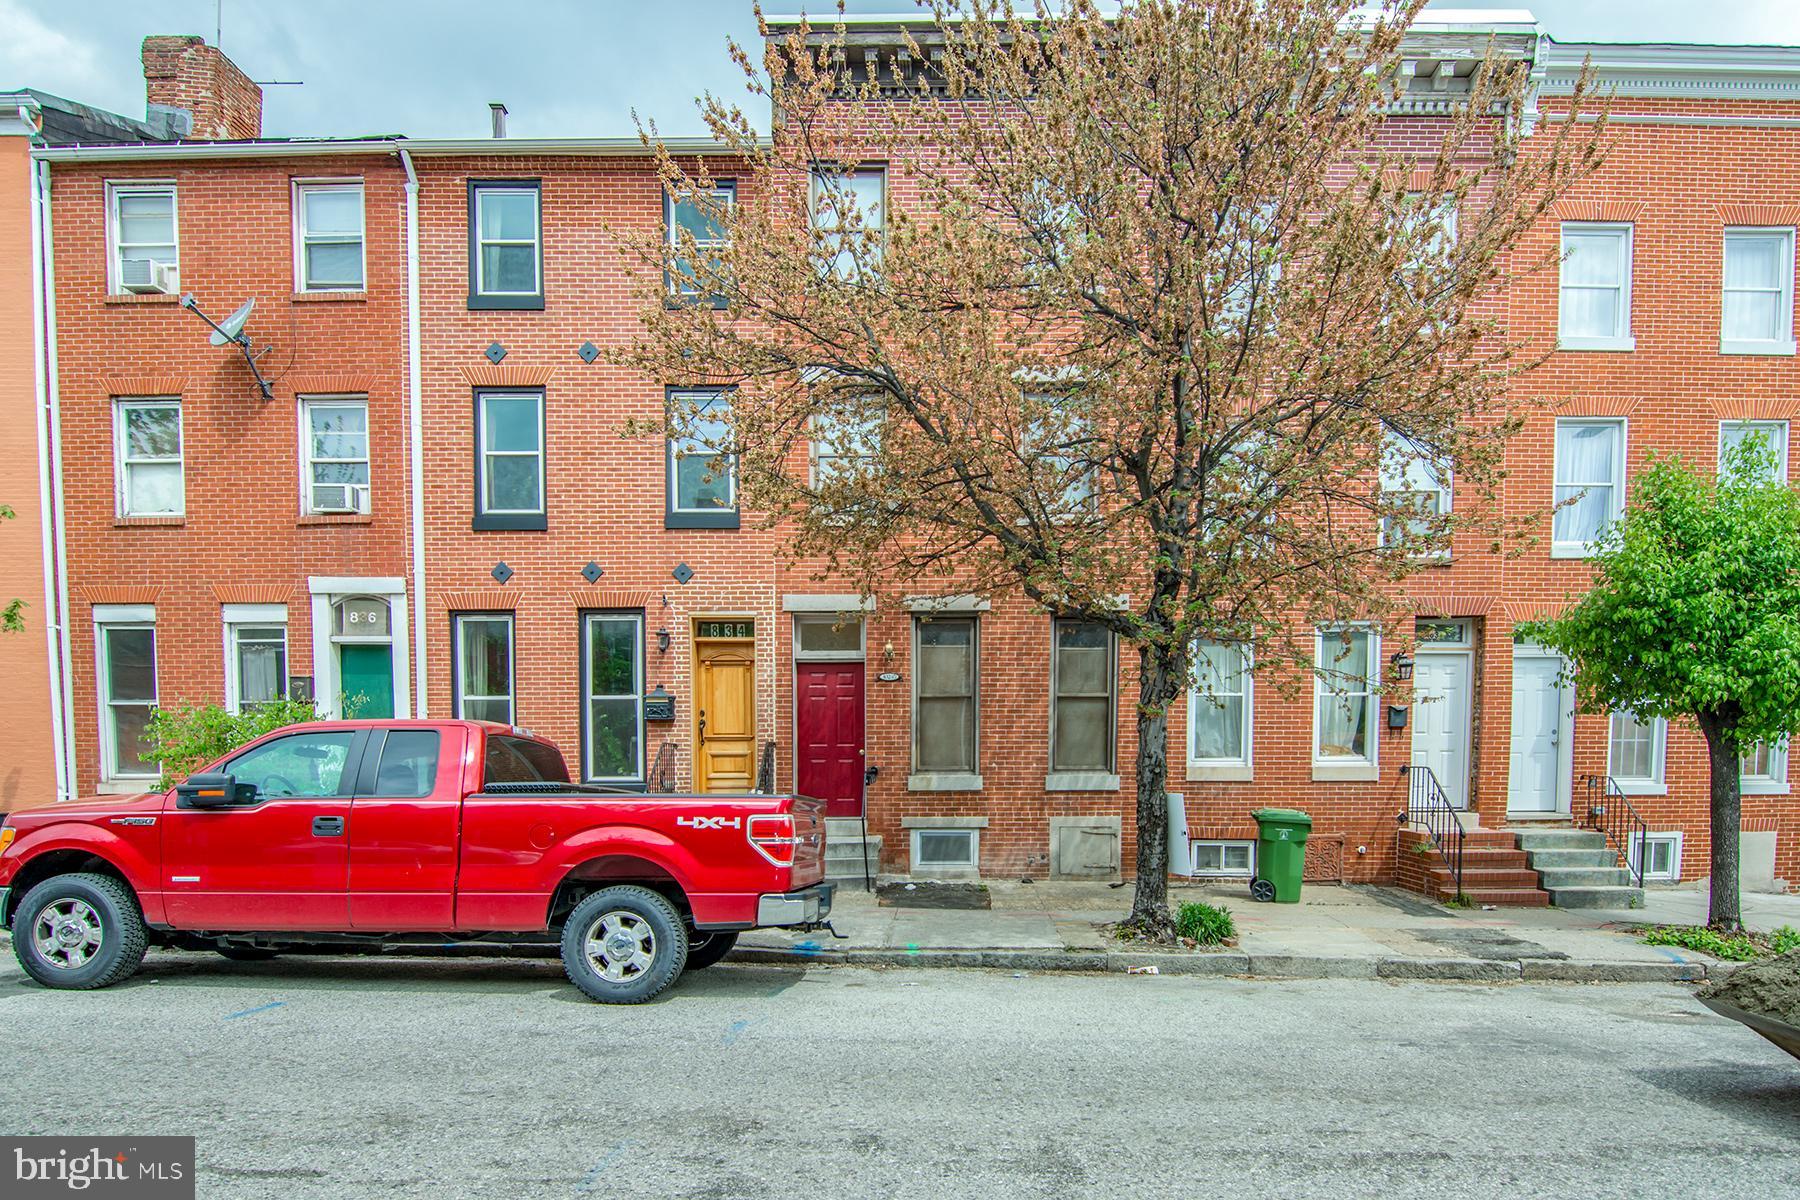 832.5 W LOMBARD STREET, BALTIMORE, MD 21201